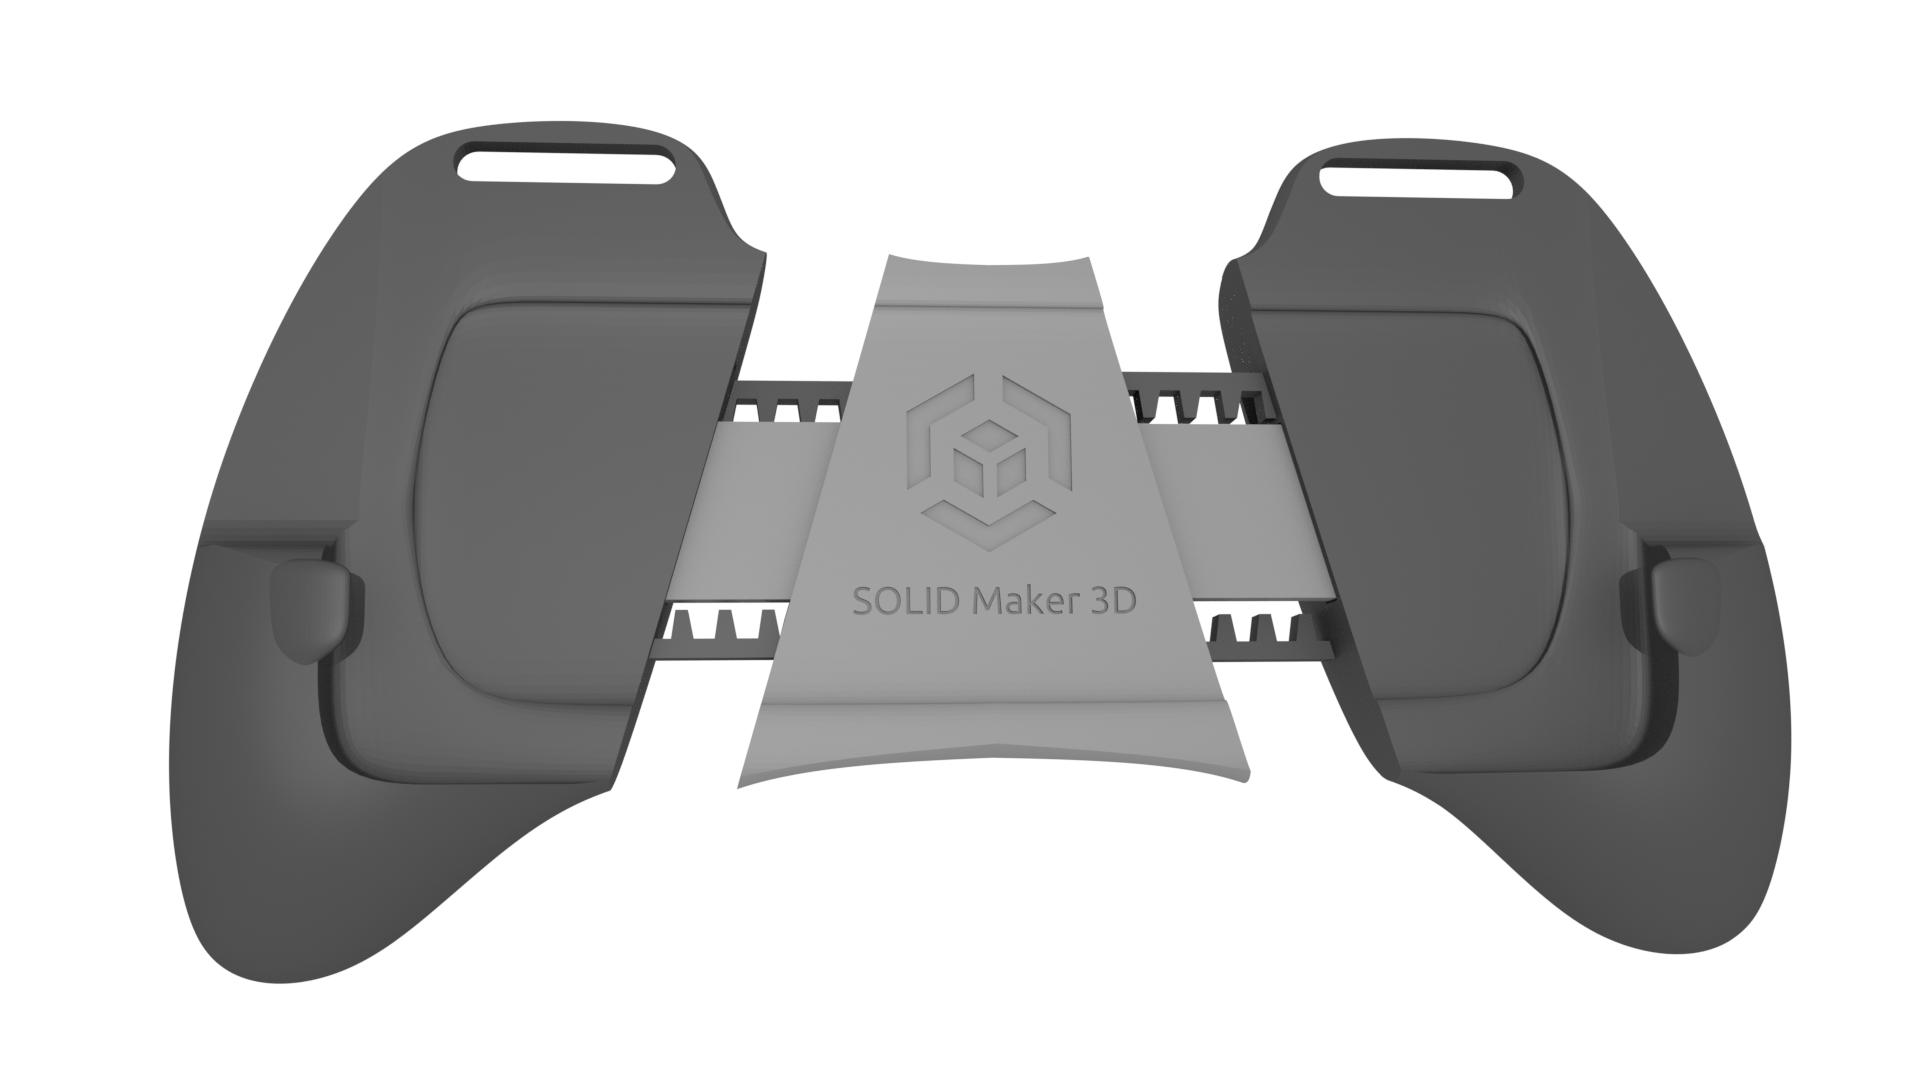 medidas.png Download STL file Gaming Grip for Smartphones • 3D printing template, SOLIDMaker3D